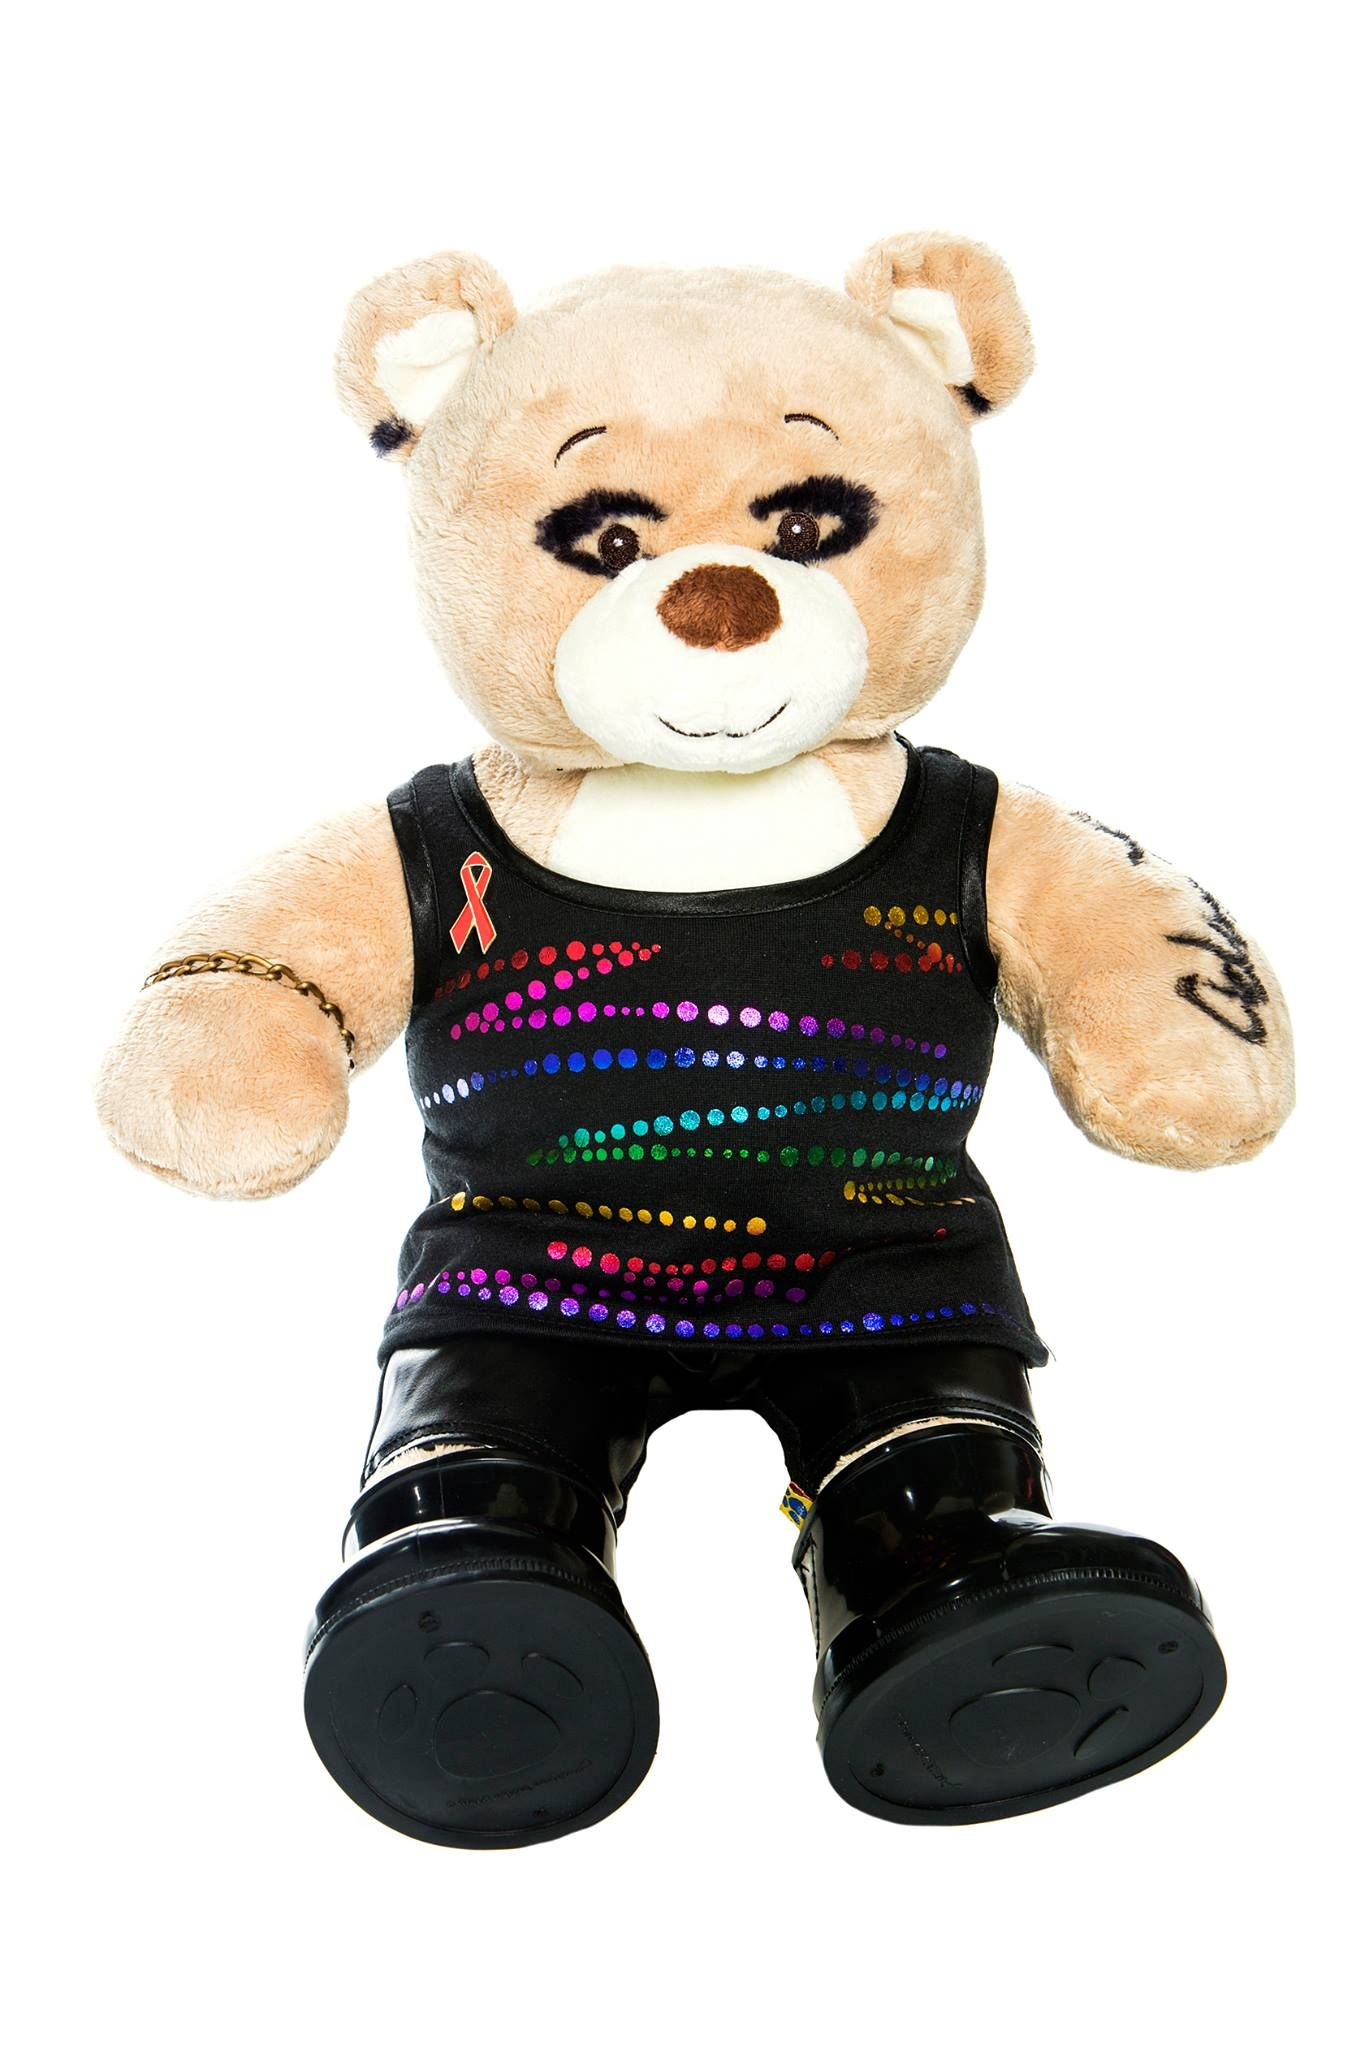 Adam's Charity Bear